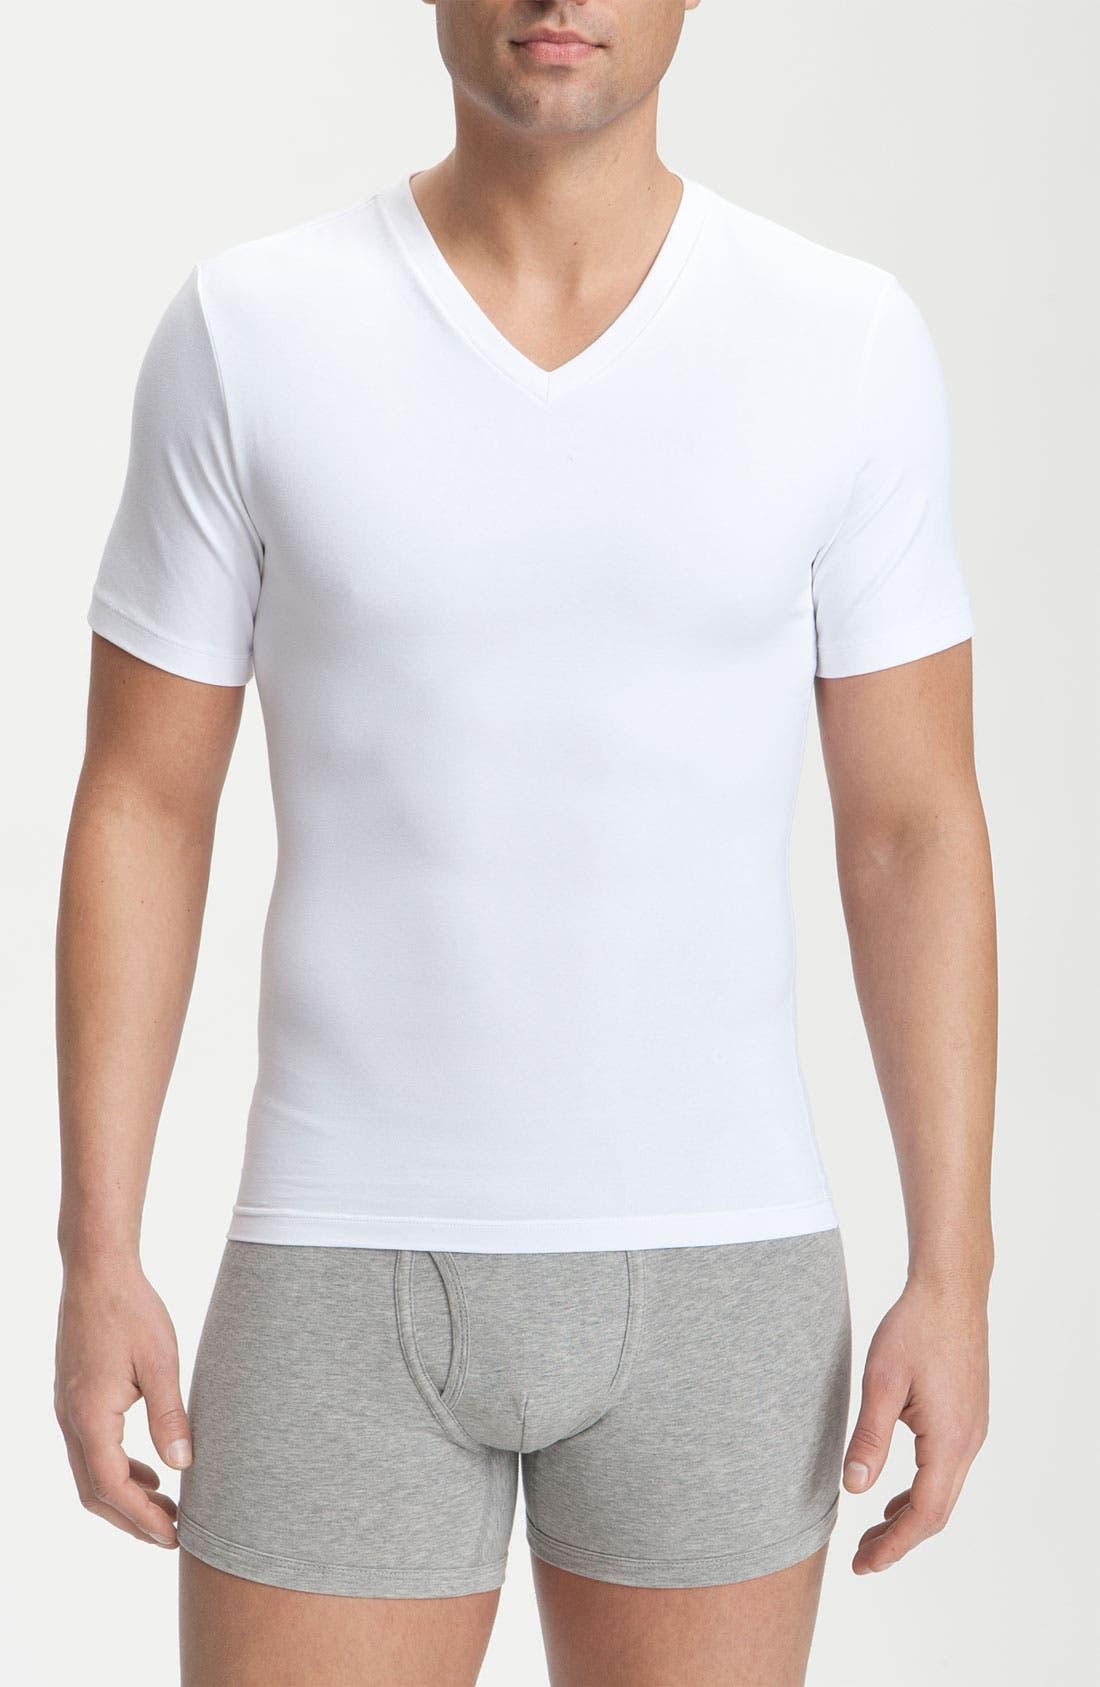 Main Image - SPANX® Cotton Control V-Neck T-Shirt